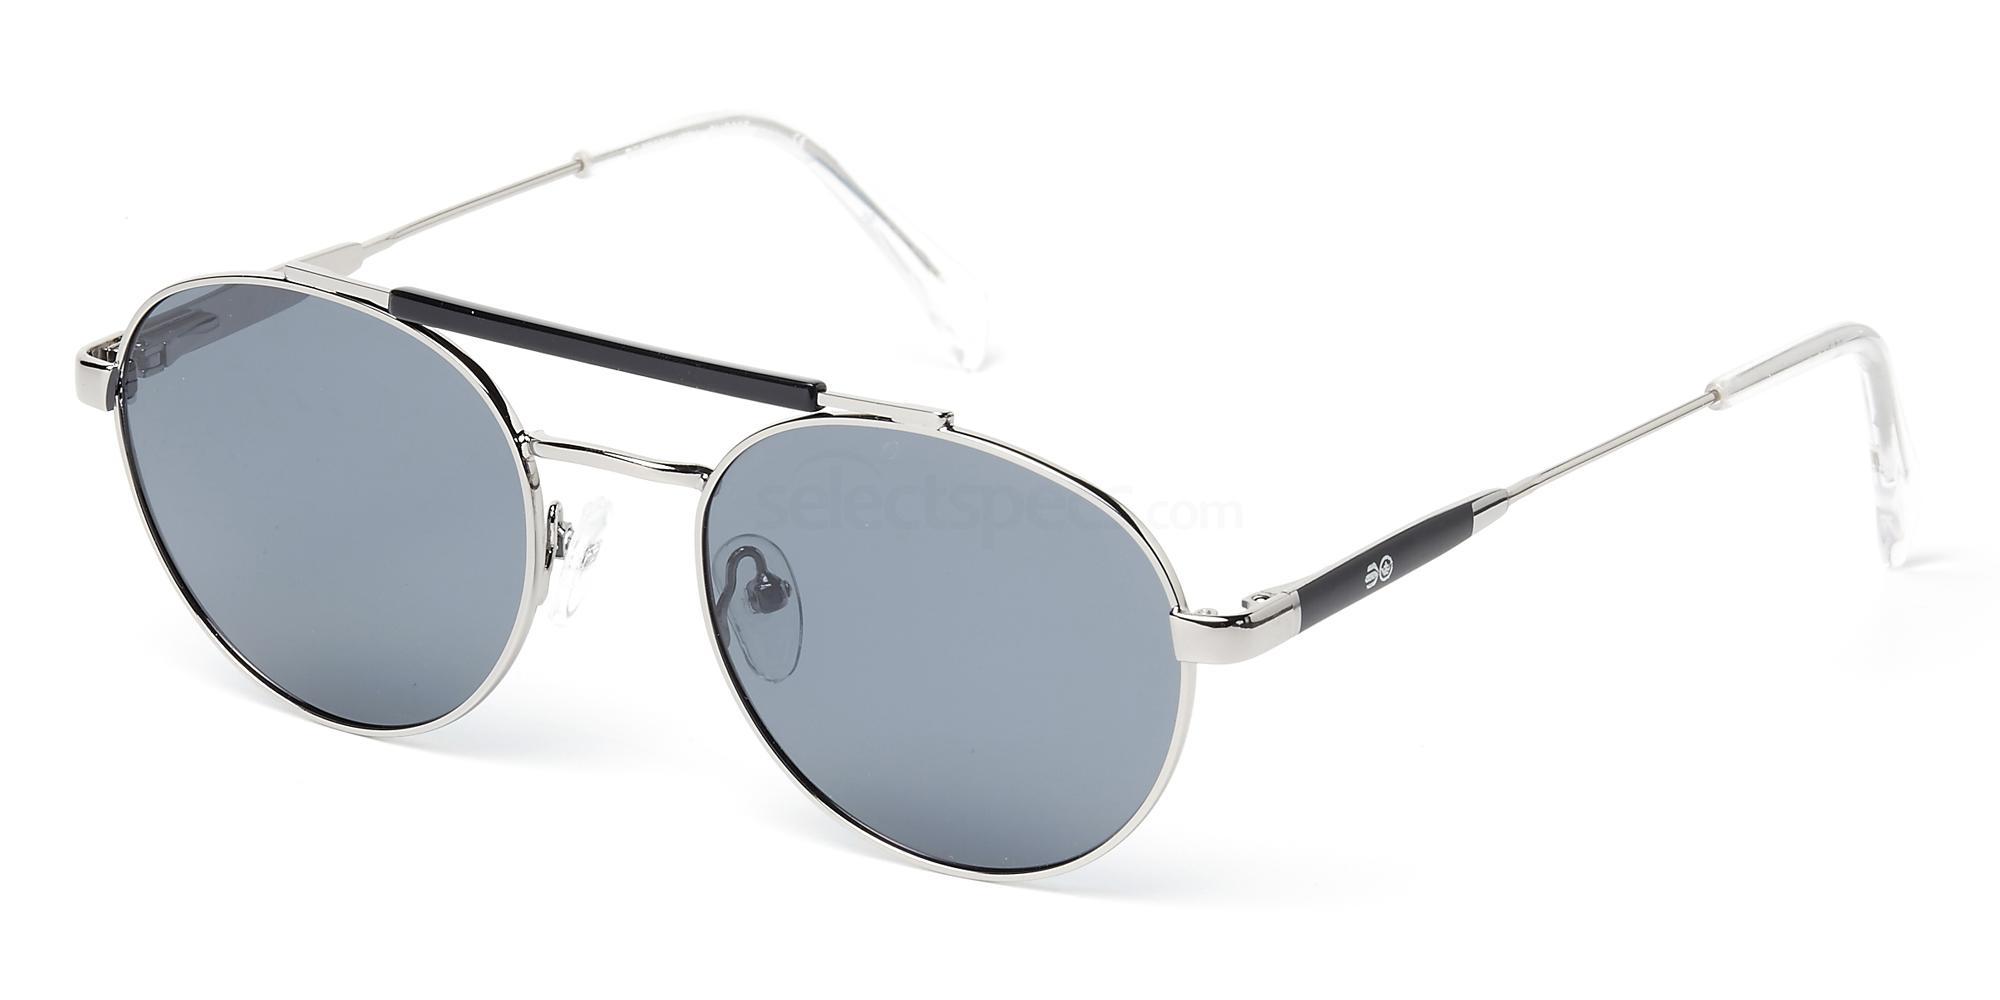 C1 CHS005 Sunglasses, Crosshatch